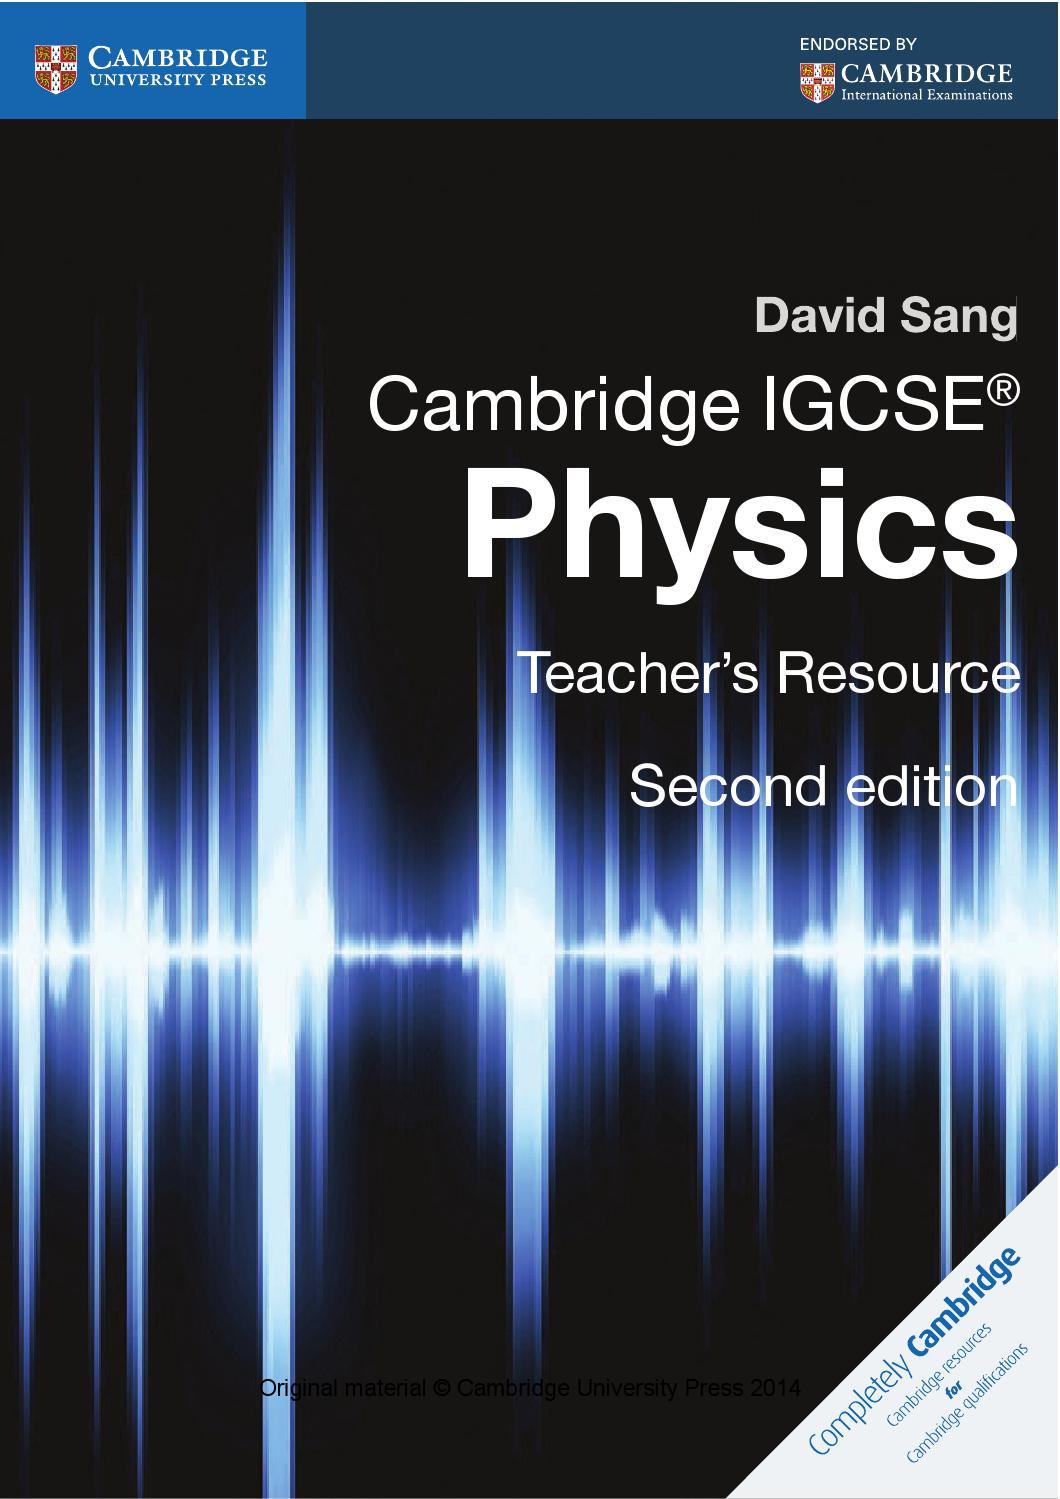 Cambridge Igcse Physics Teacher S Resource Second Edition By